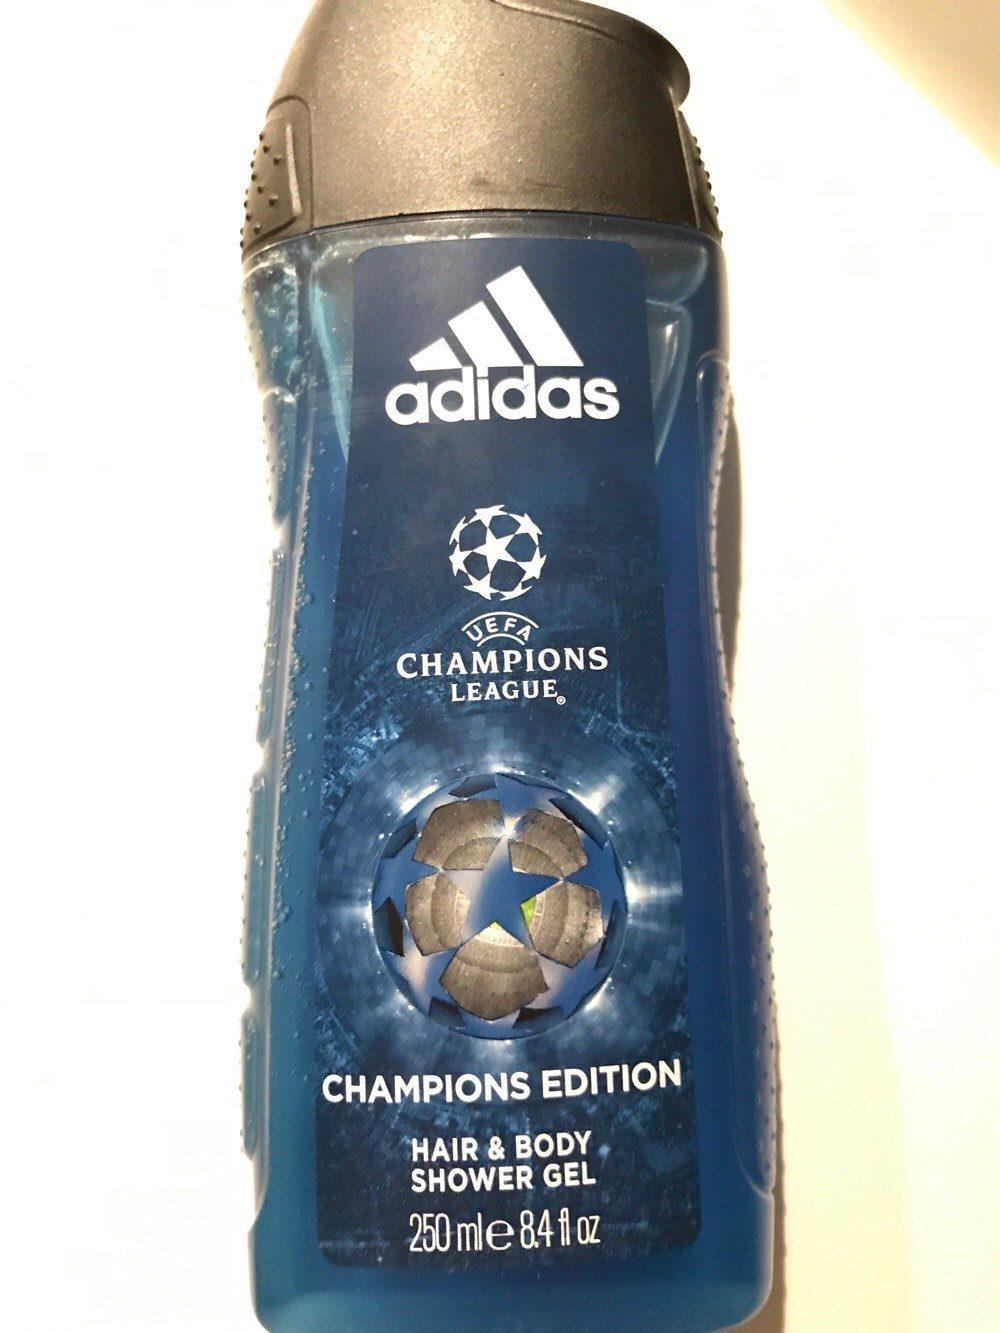 Duschbad Adidas - Product - de